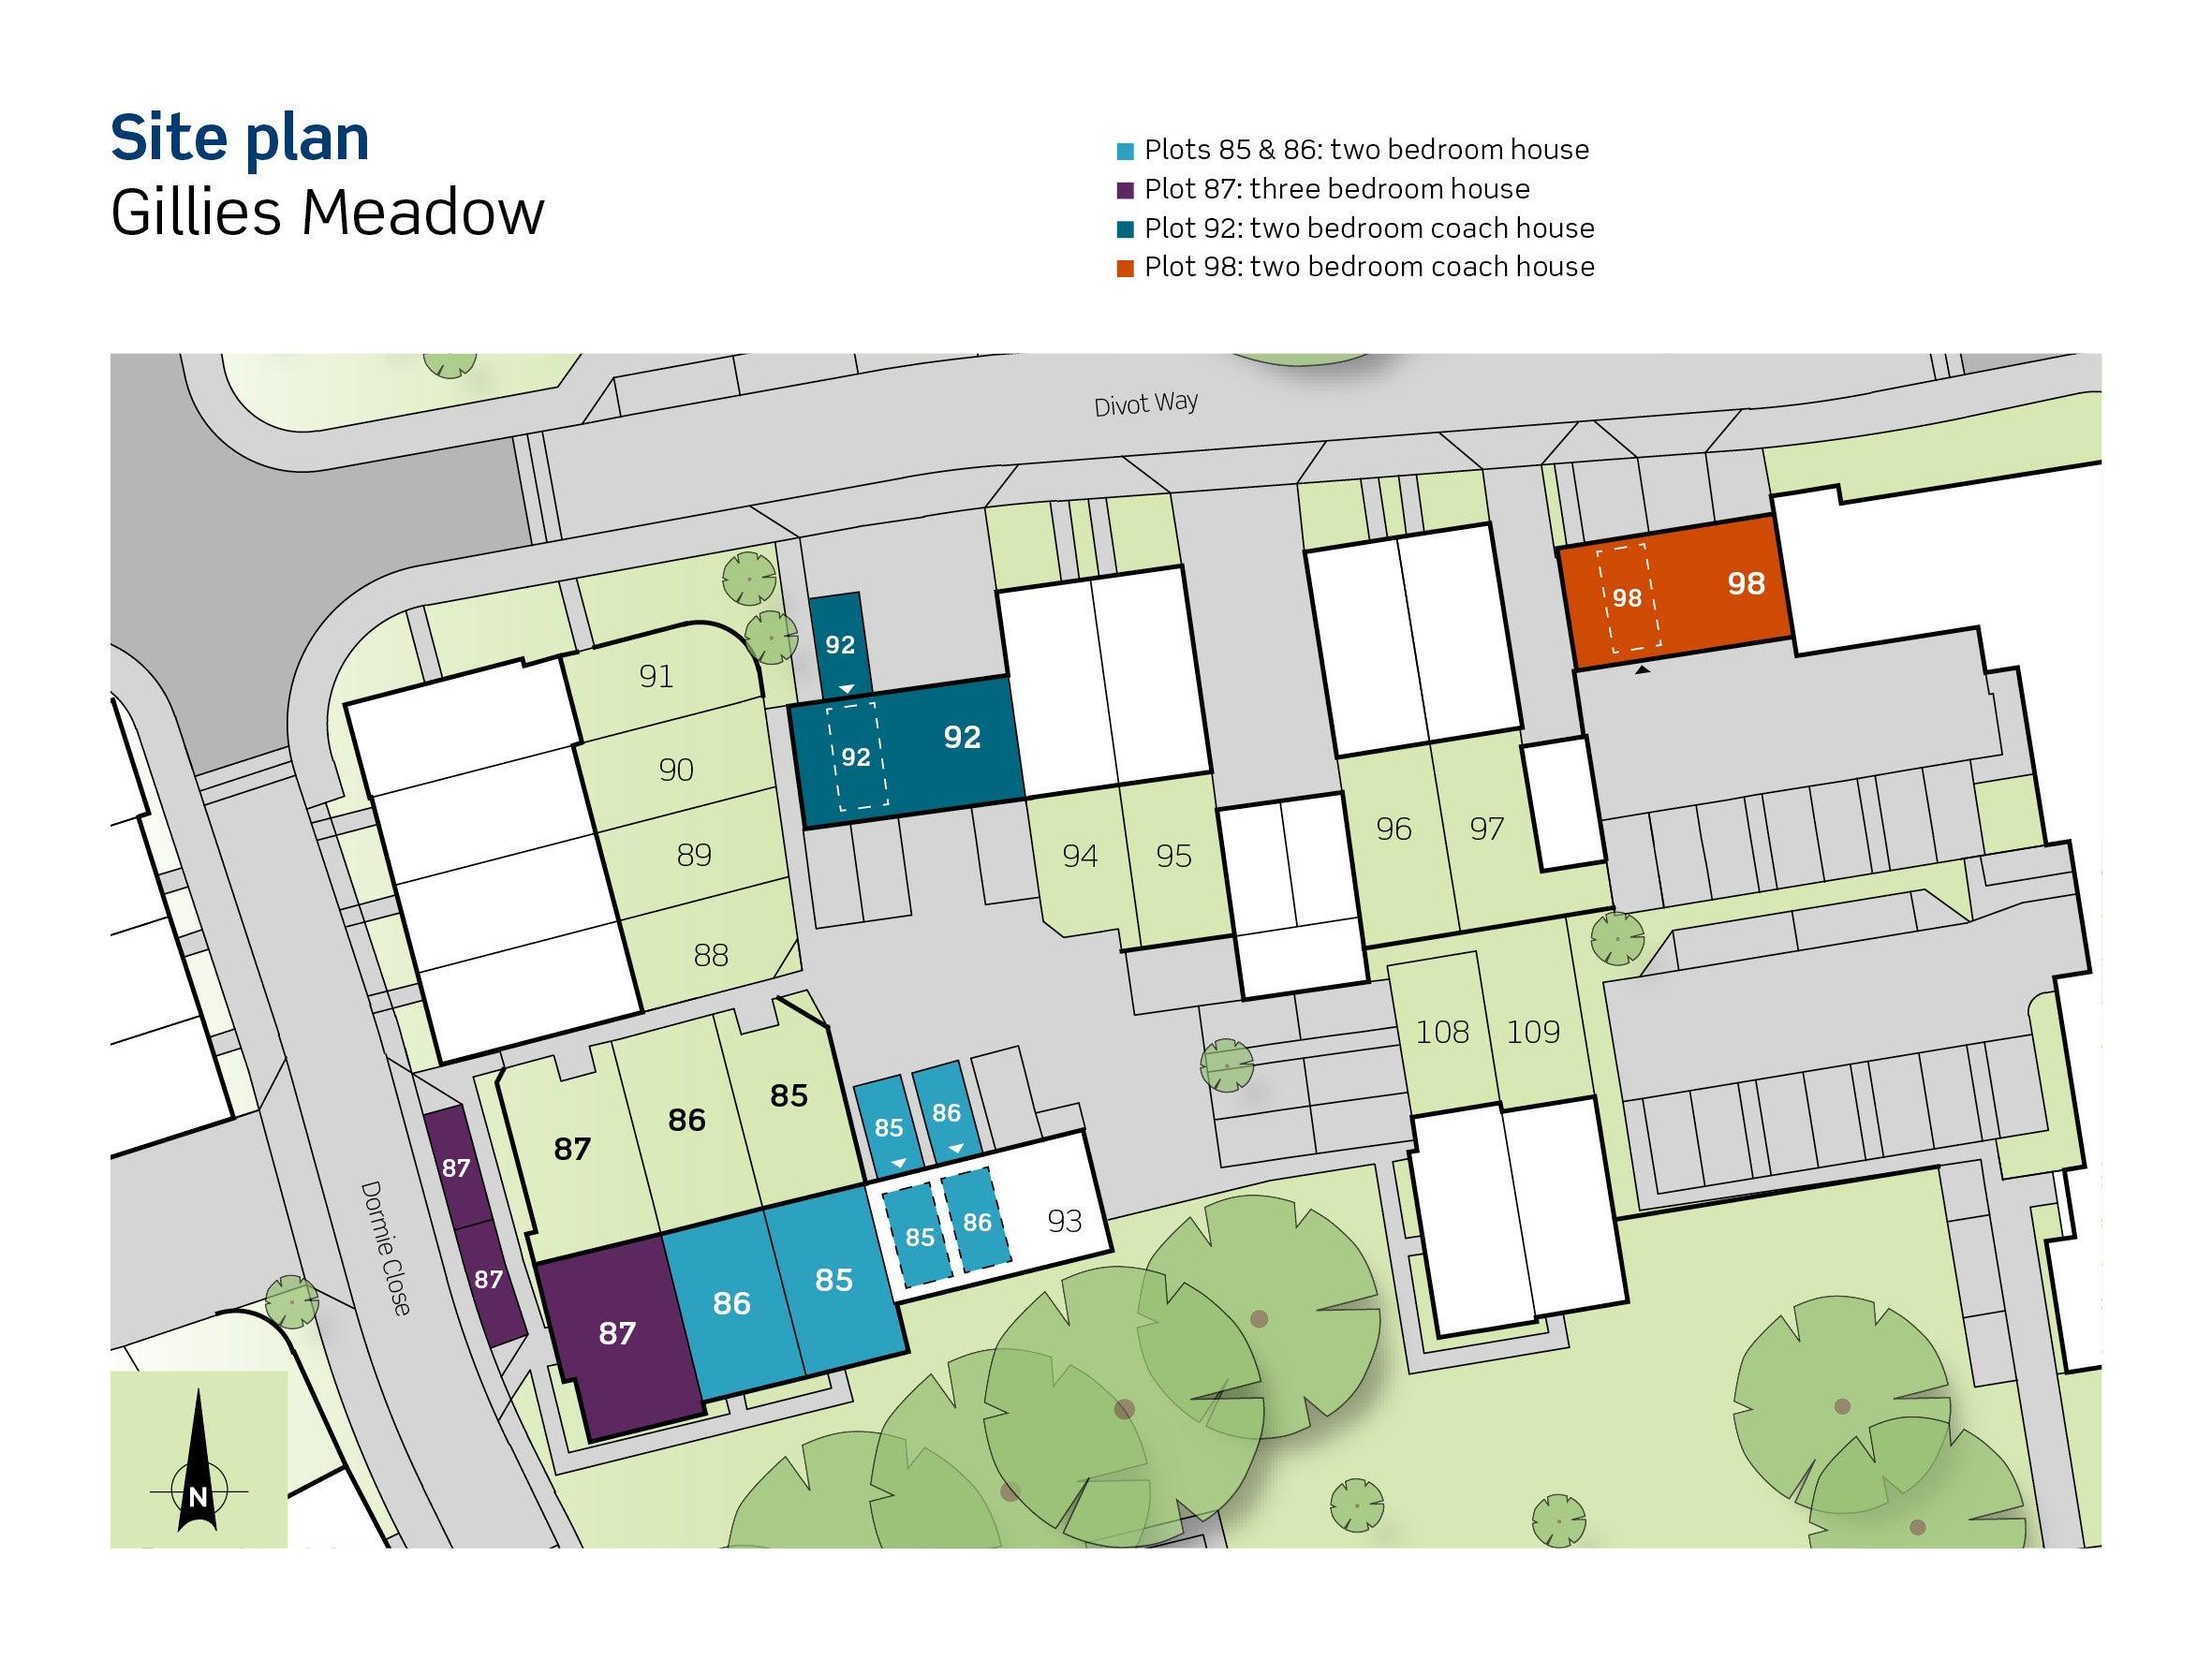 Gillies Meadow siteplan